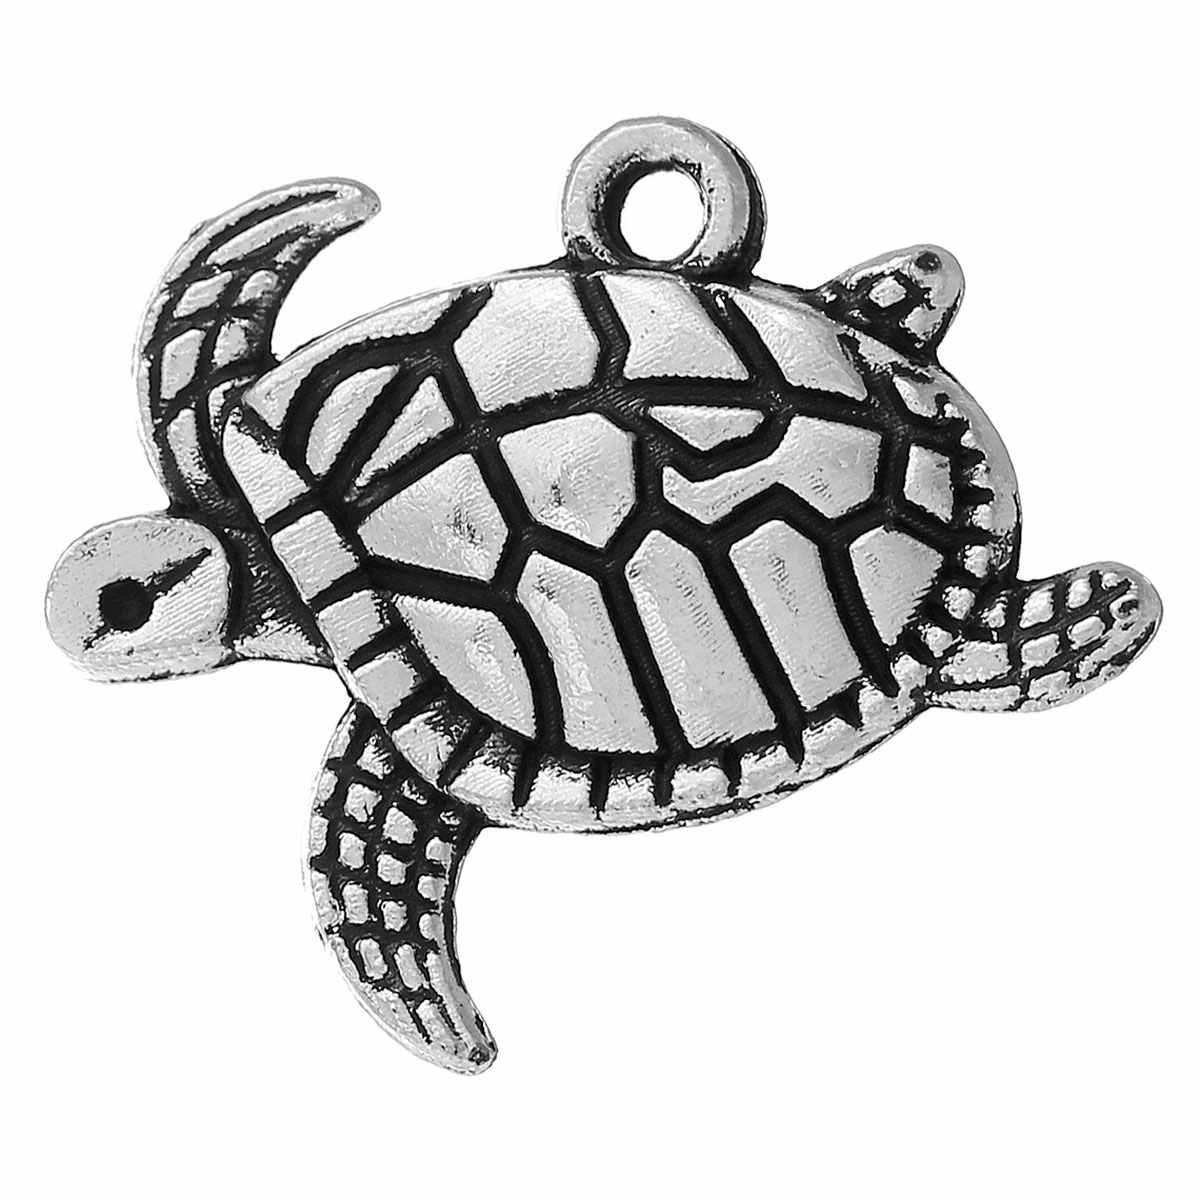 "DoreenBeads معدن الزنك سبيكة دلايات المعلقات السلاحف البحرية العتيقة الفضة 20 مللي متر (6/8 "") x 17 مللي متر (5/8"") ، 4 قطعة"